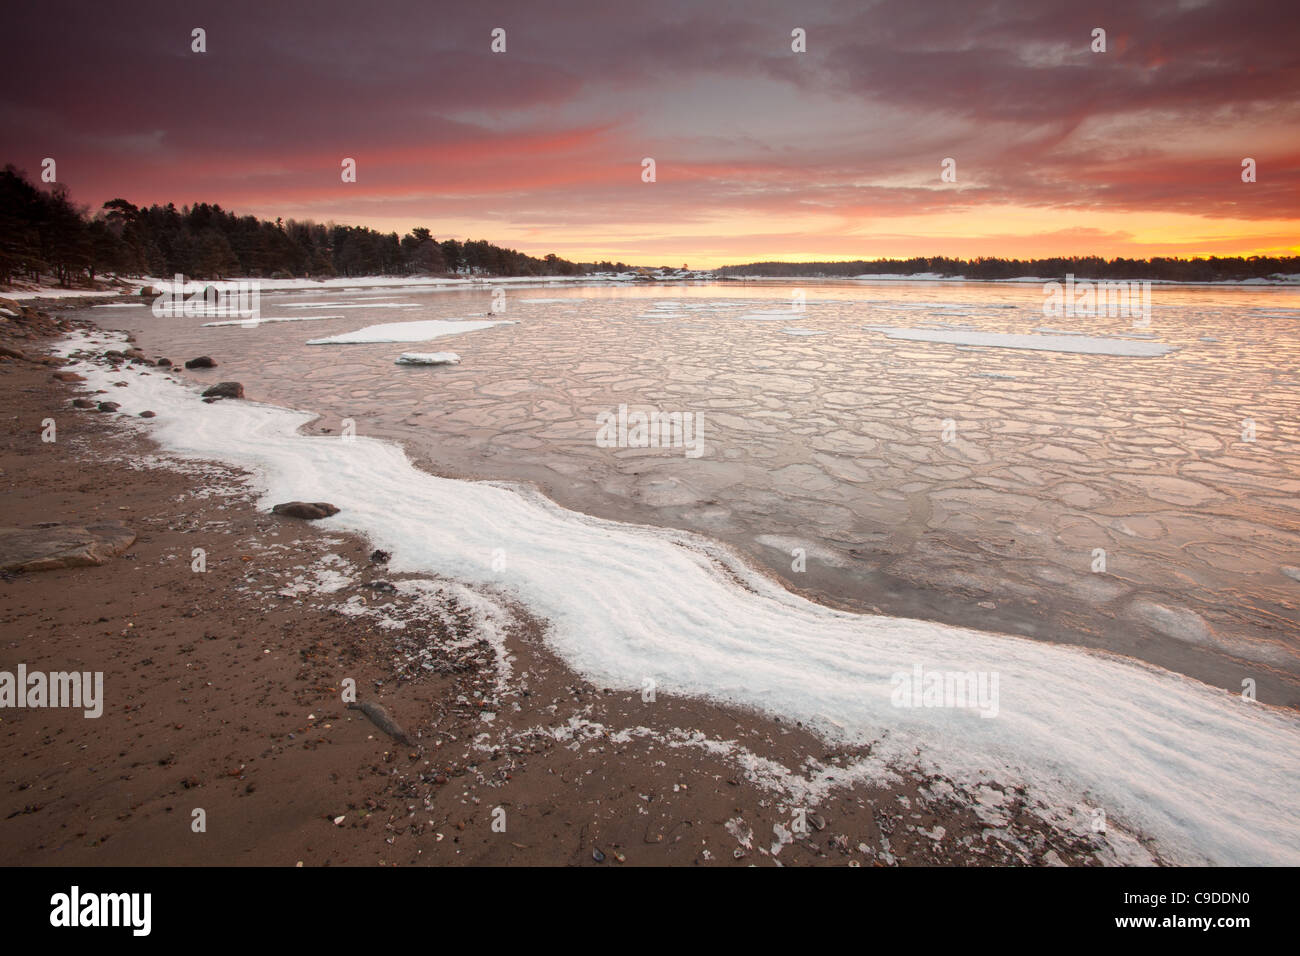 Colorful winter morning at Oven in Råde kommune, Østfold fylke, Norway. - Stock Image